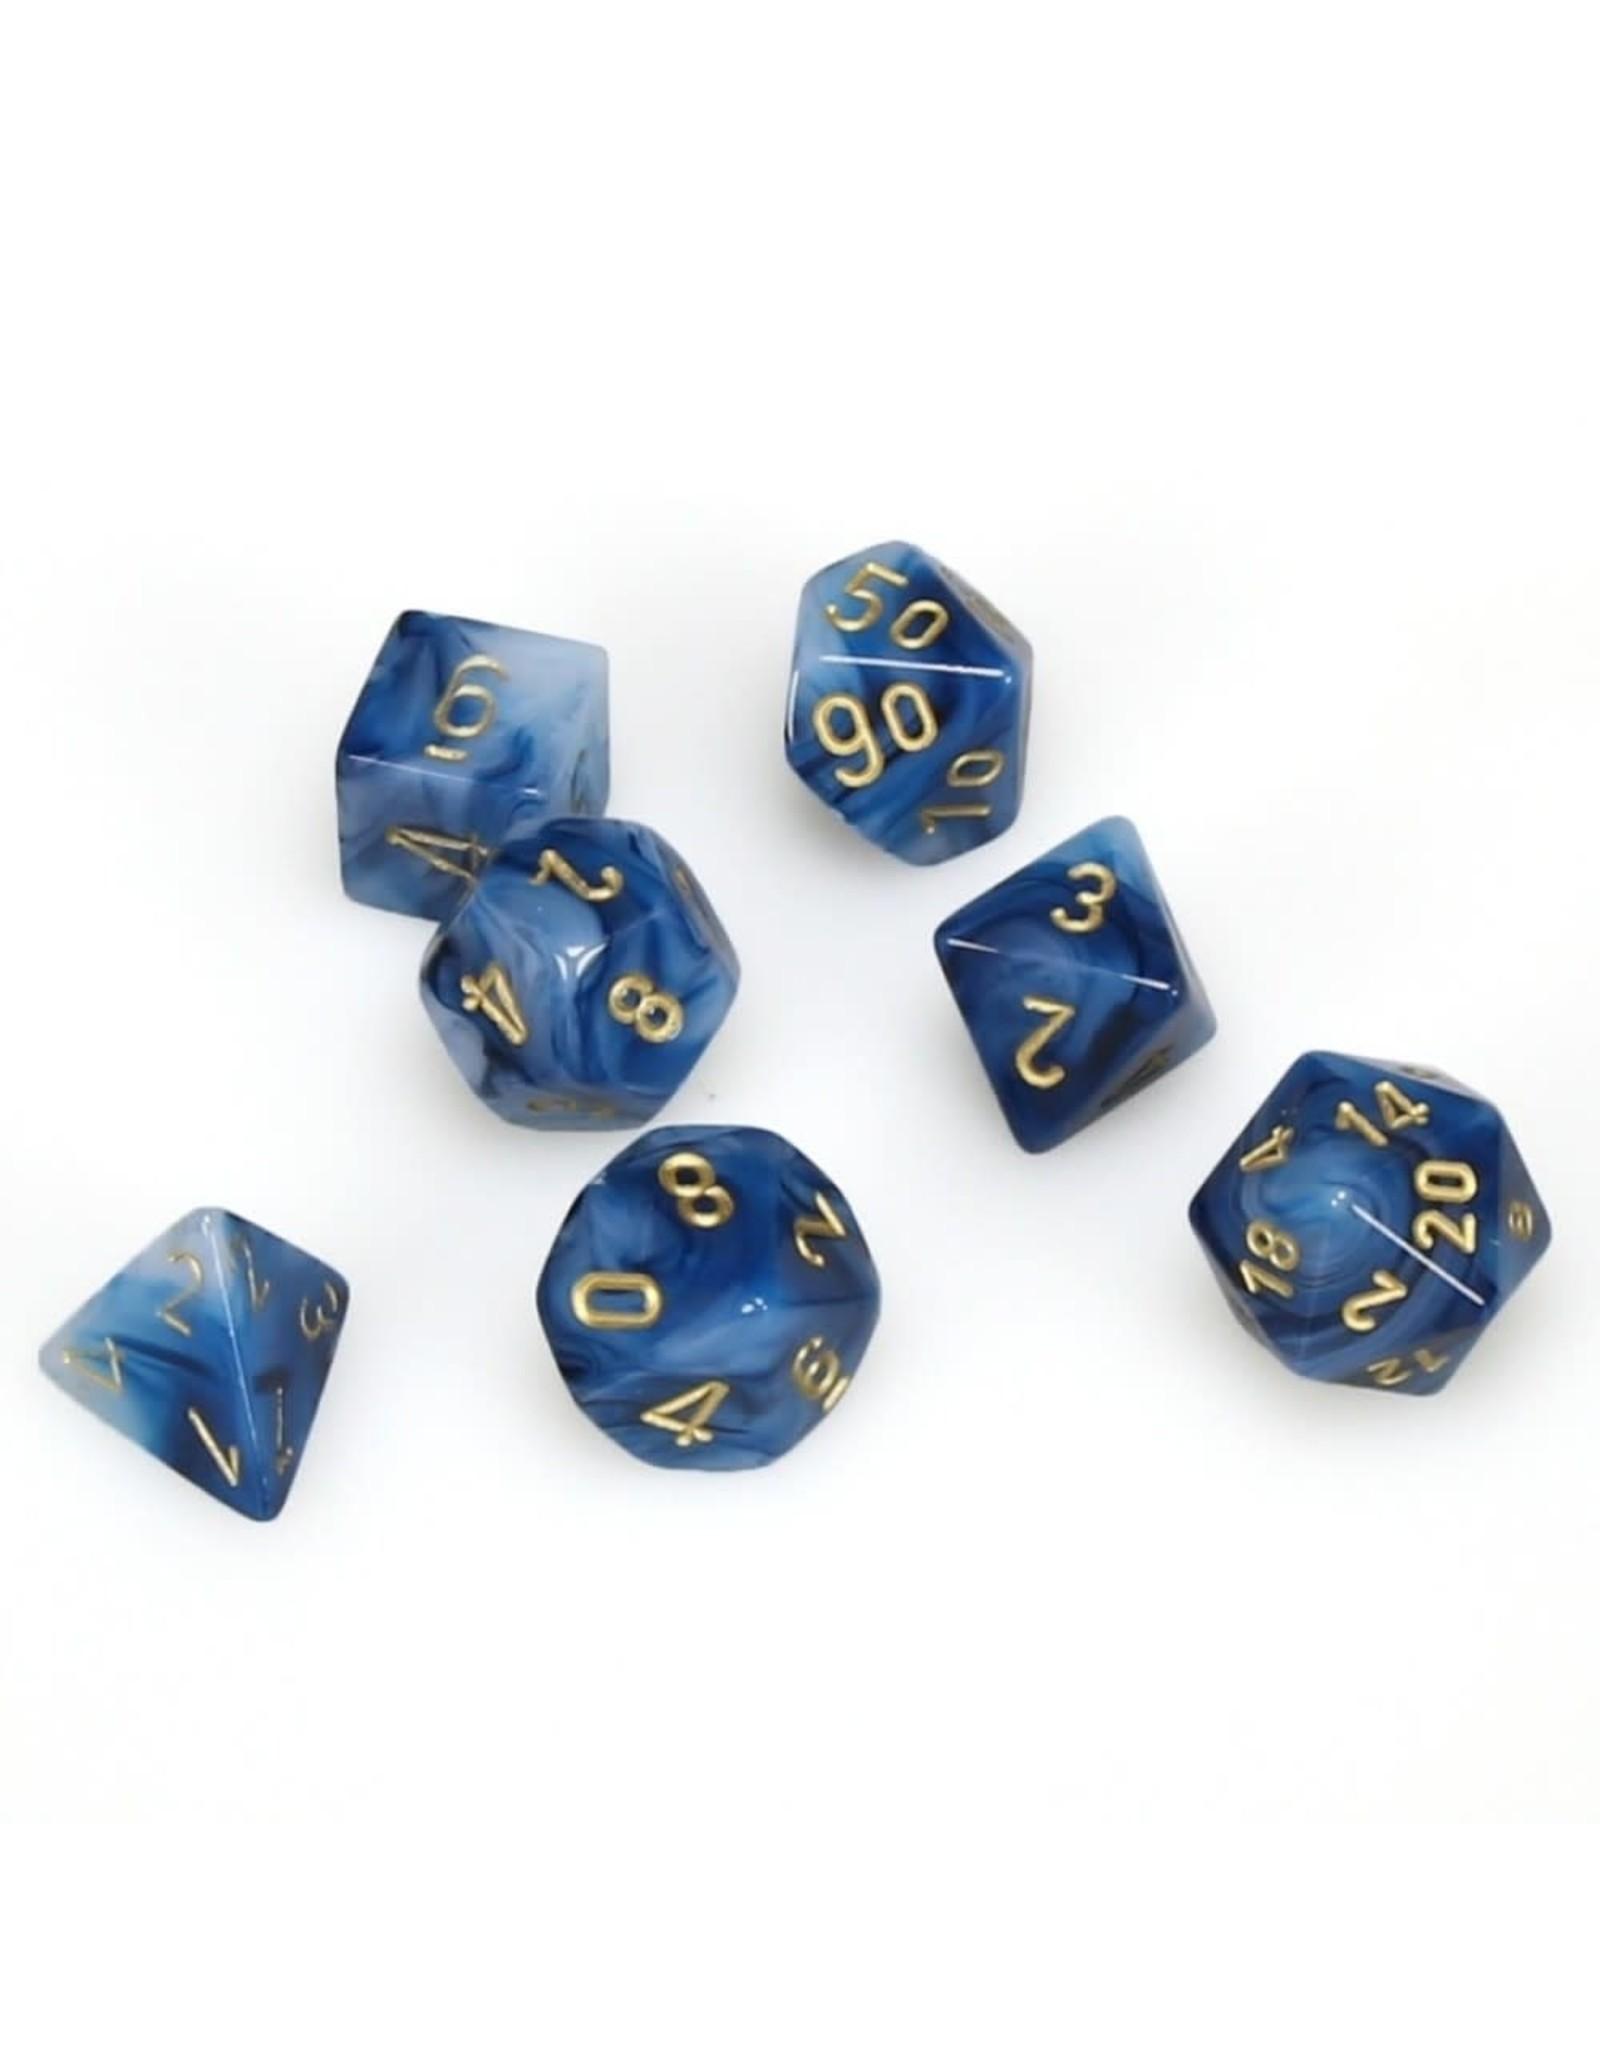 Chessex 7PC RPG DICE PHANTOM TEAL/GOLD